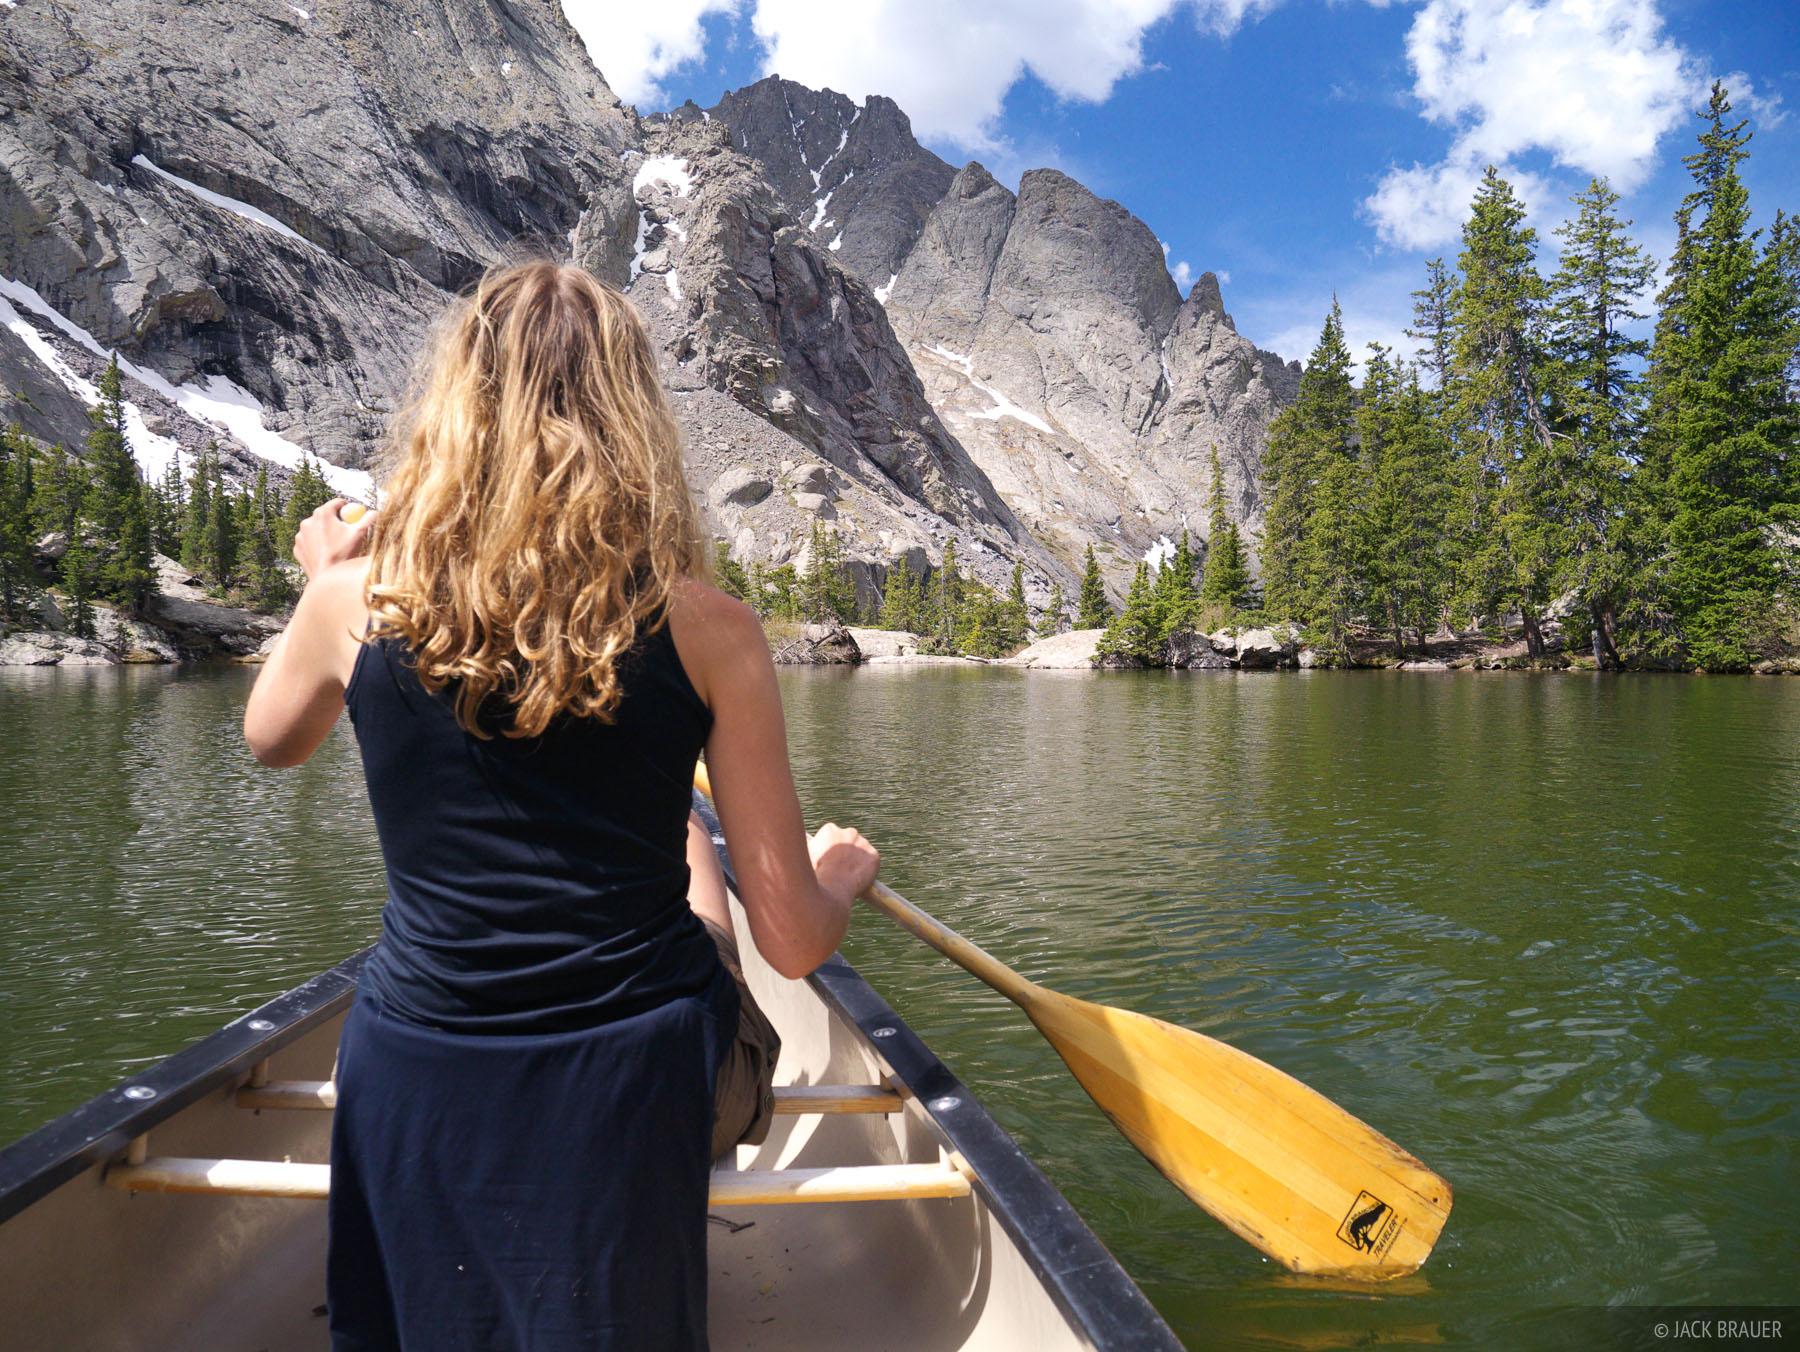 Canoeing on Willow Lake in the Sangre de Cristo Range, Colorado.